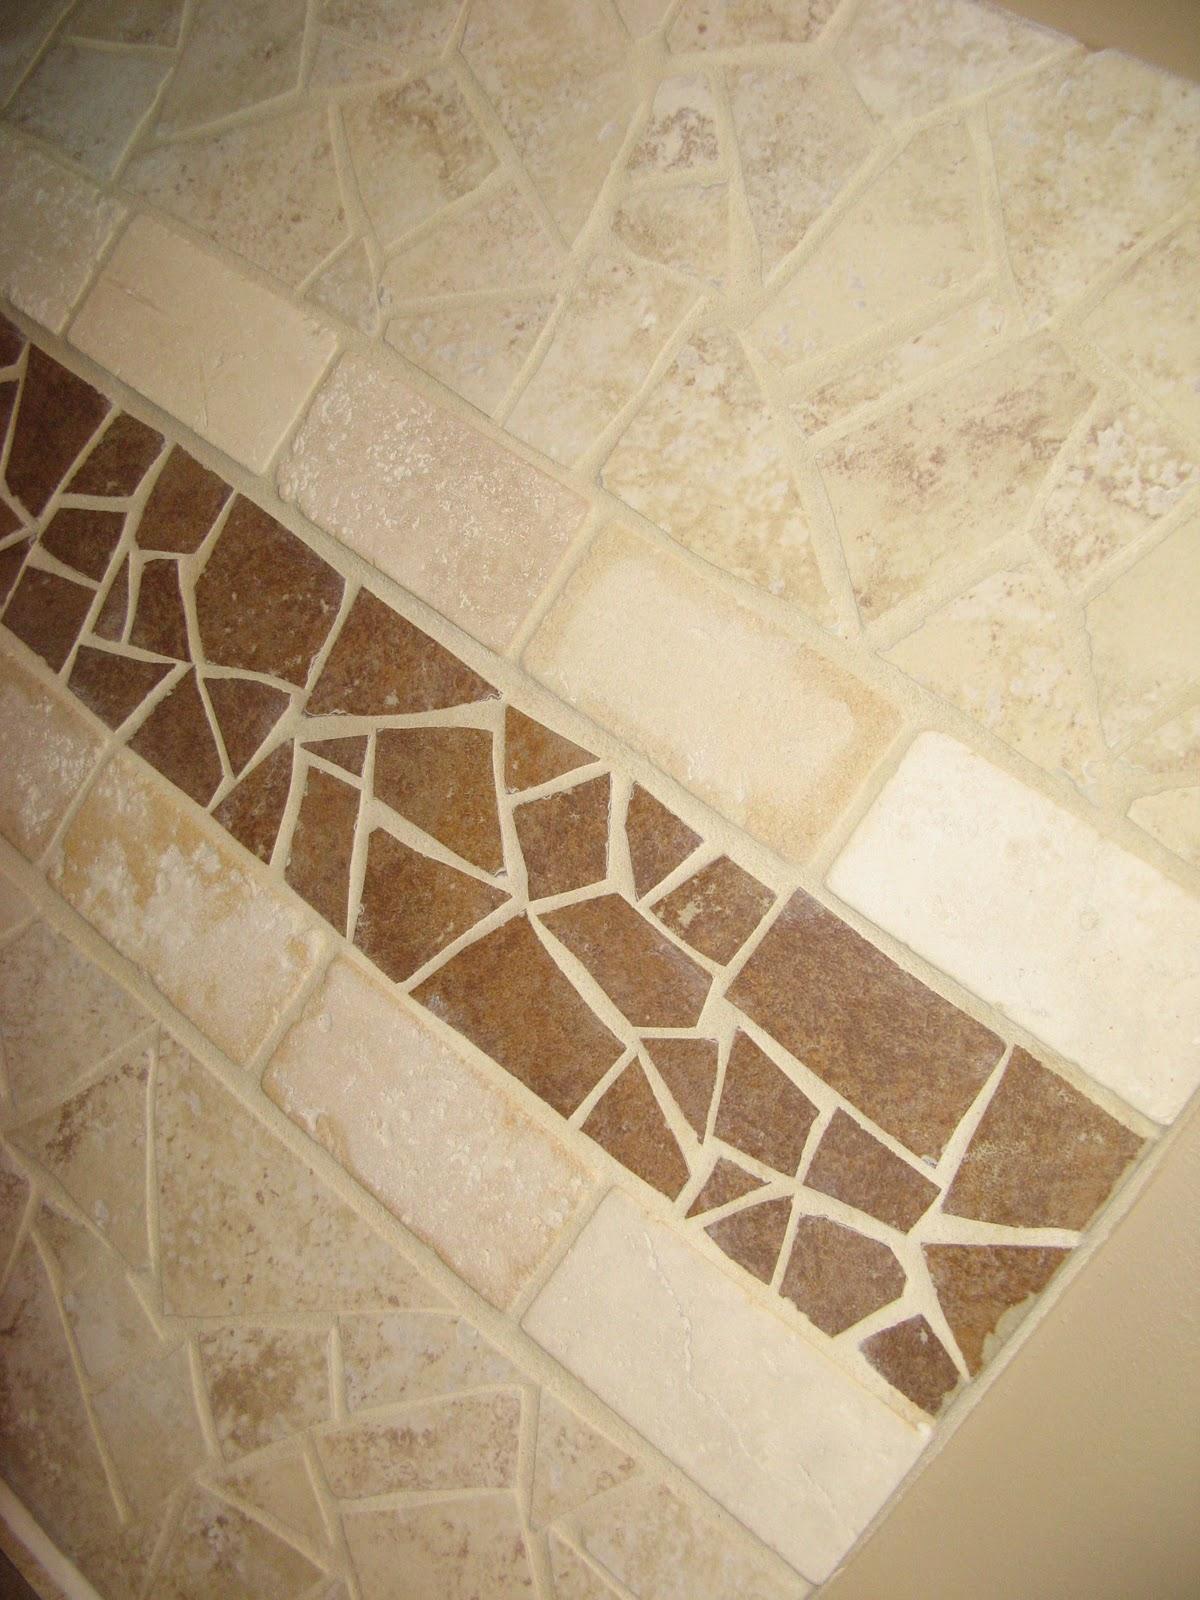 Broken Ceramic Tile Mosaic Backsplash Close Up